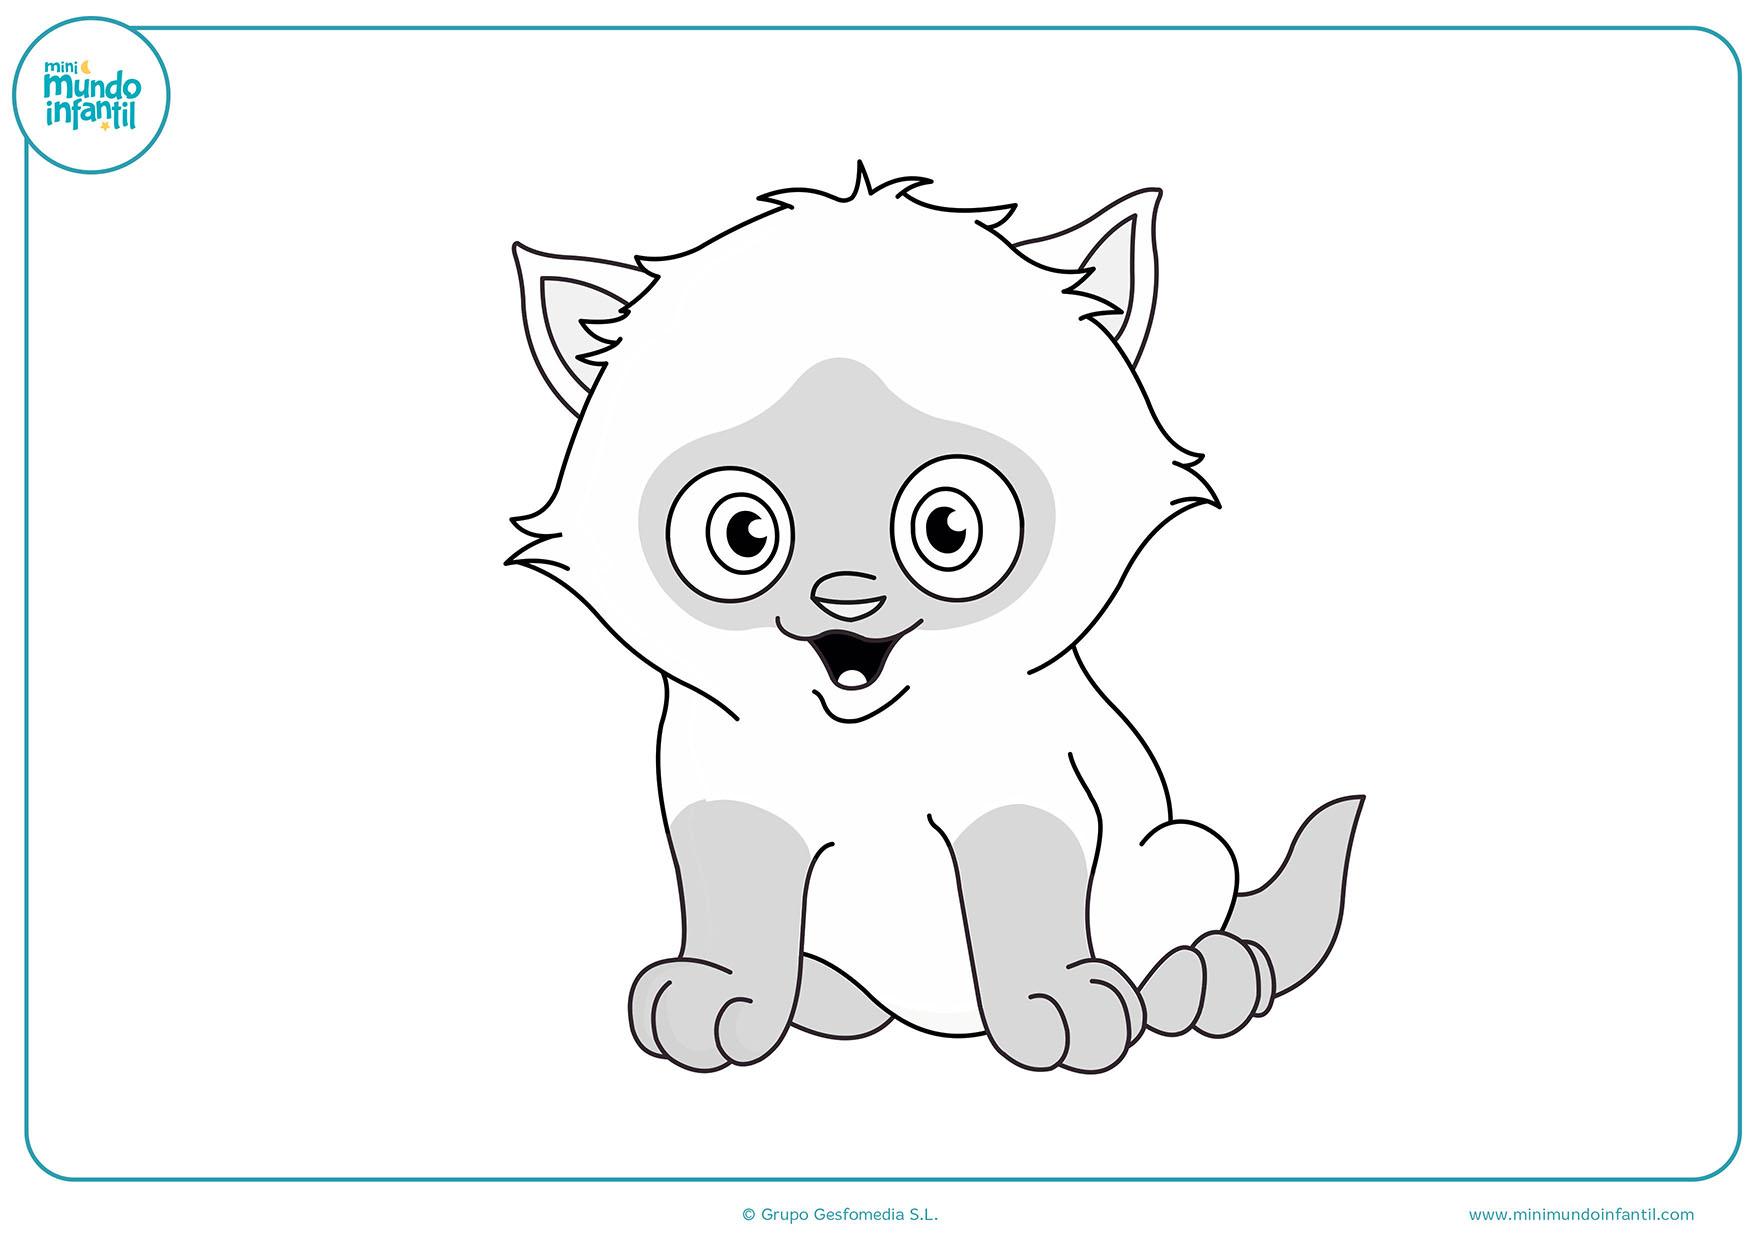 Gatos Para Imprimir. Great Dibujos De Gatos Para Imprimir A Color ...